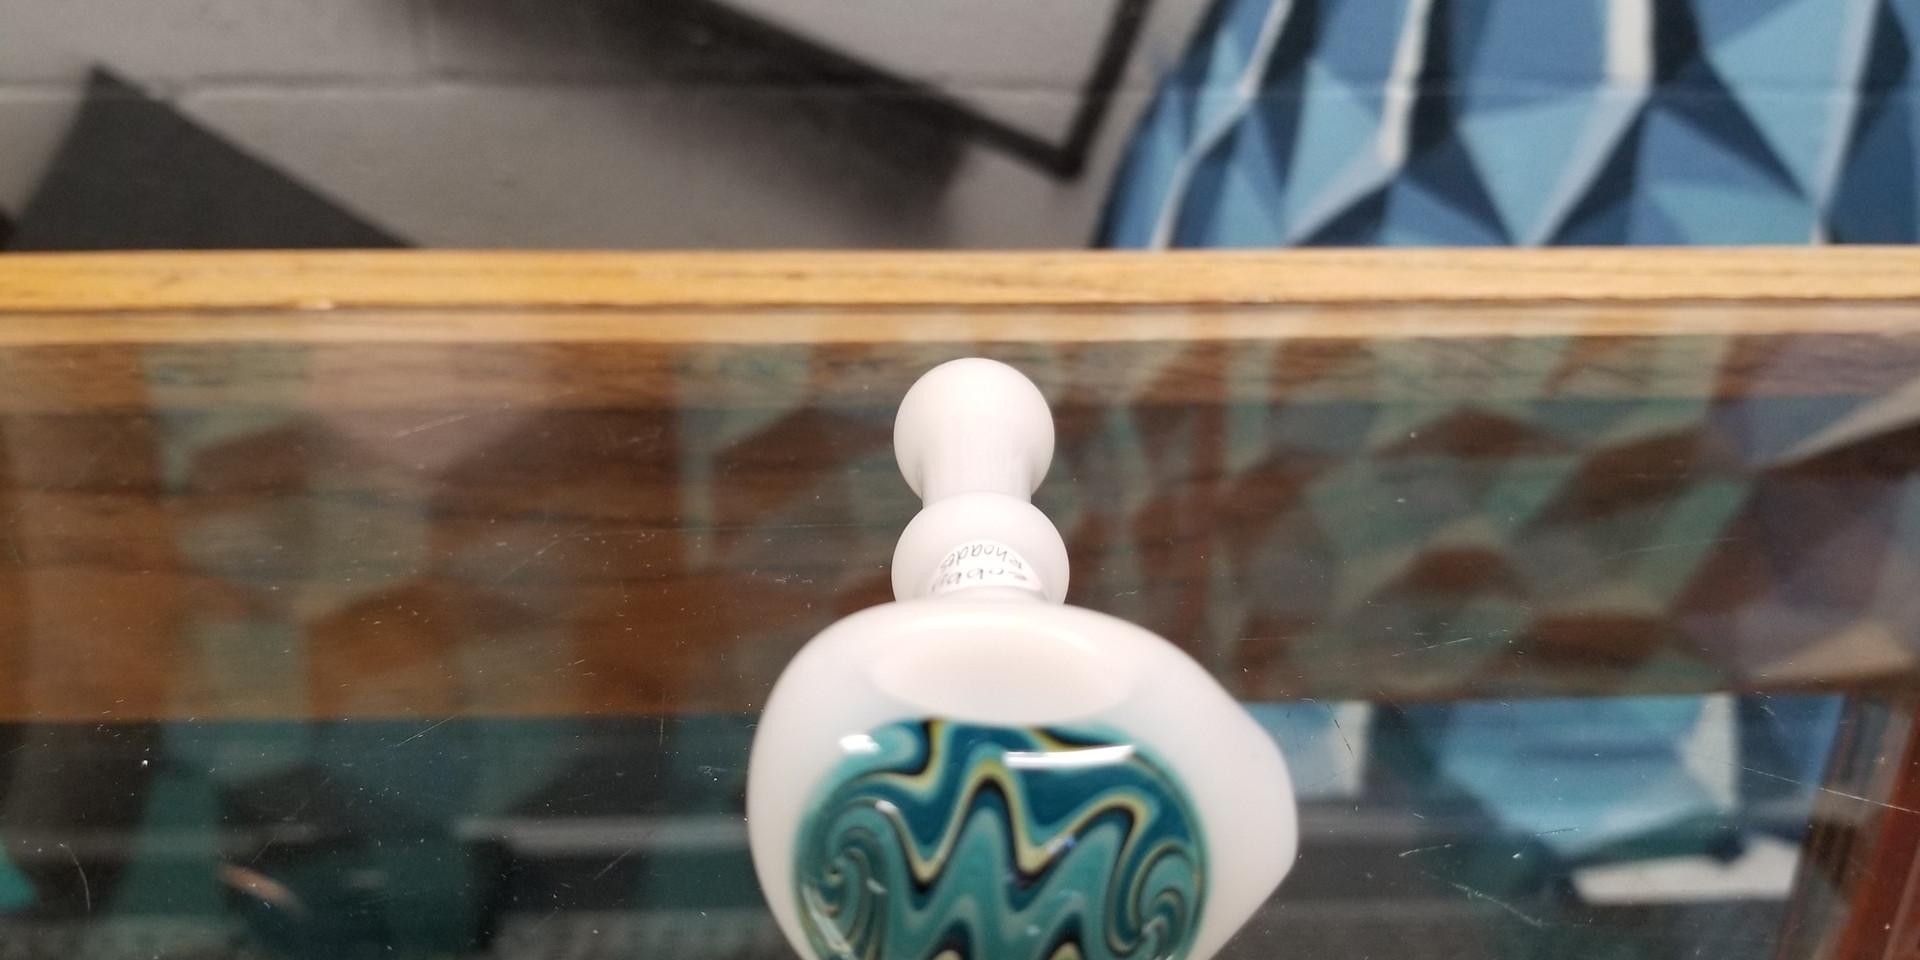 Bud-ee's Smoke & Vape, Manor, Tx 78653 - Glass Pipes